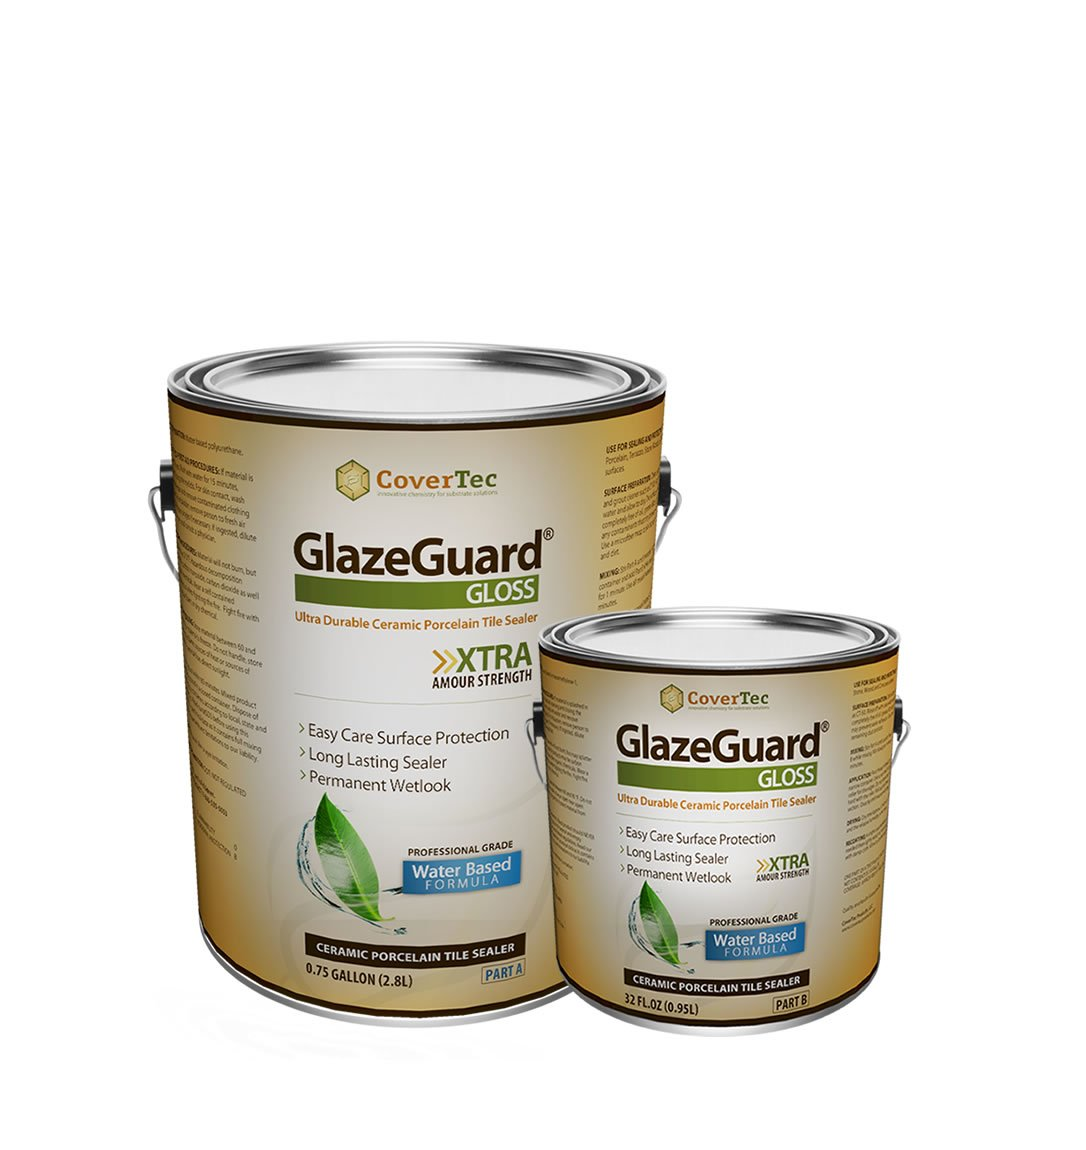 Vinylguard gloss wb polyurethane vinylterrazzo coating hgloss 07a6b627f0611463429069 gg 1 gal gloss kitg dailygadgetfo Choice Image